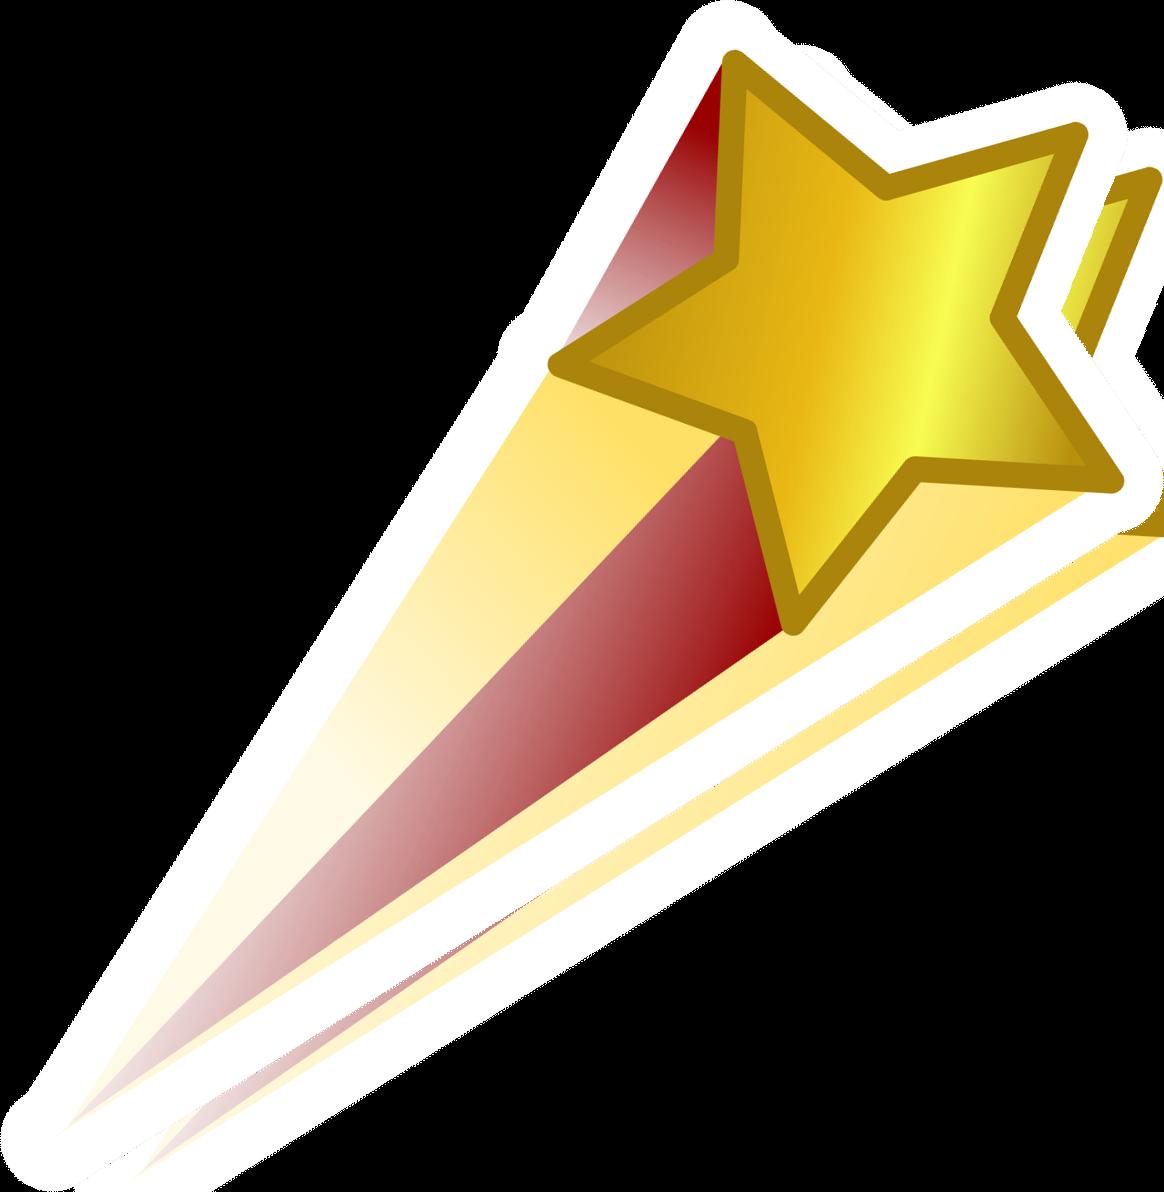 Falling Stars clipart superstar Wiki powered Pin Club Star